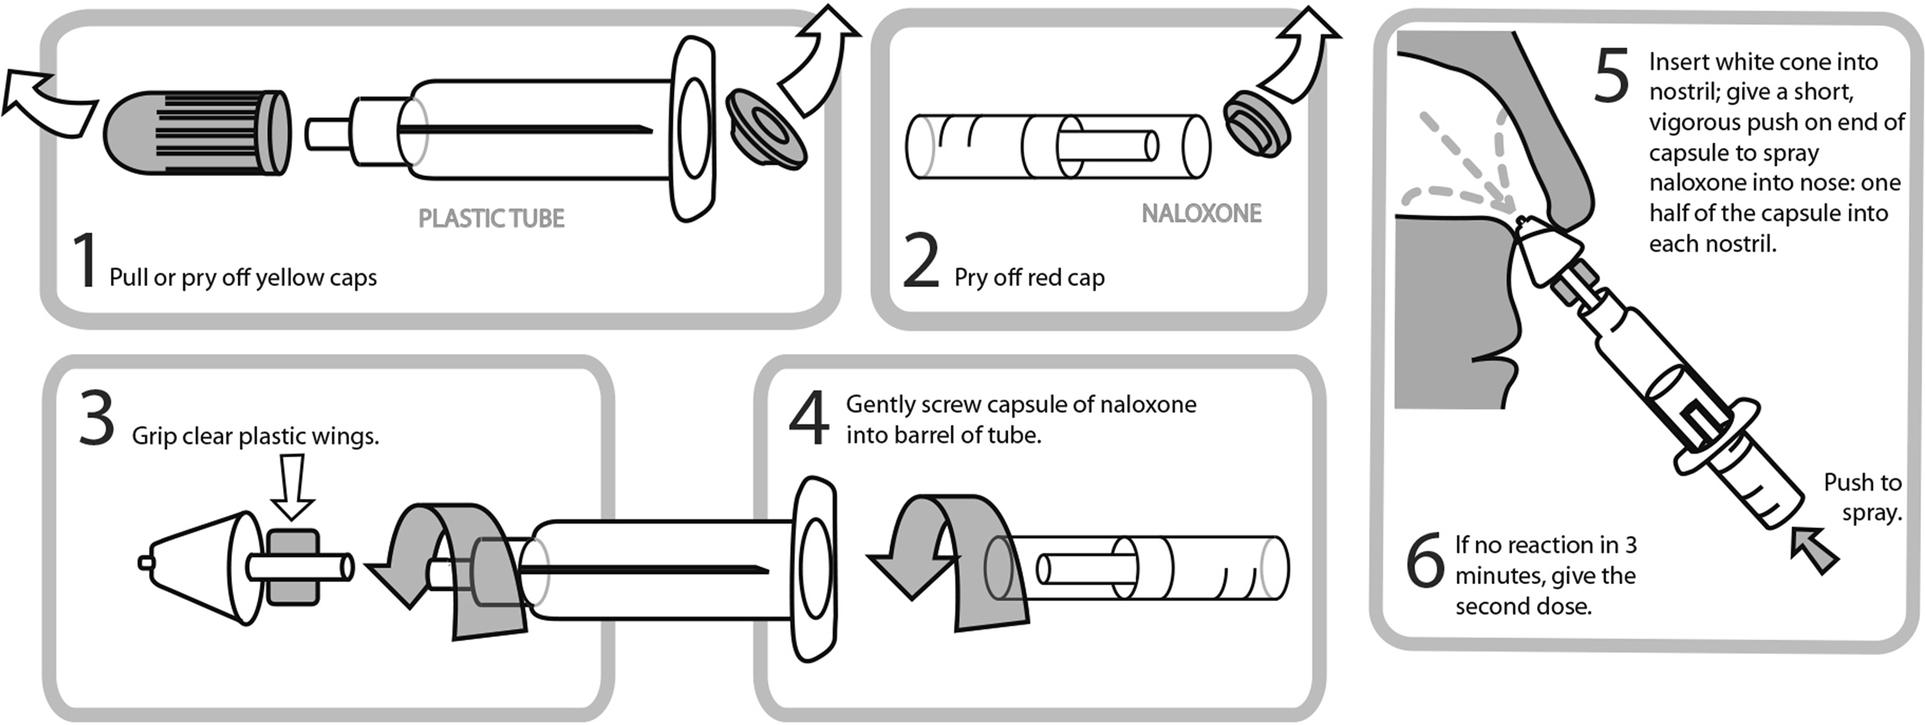 Comparative Human Factors Evaluation of Two Nasal Naloxone